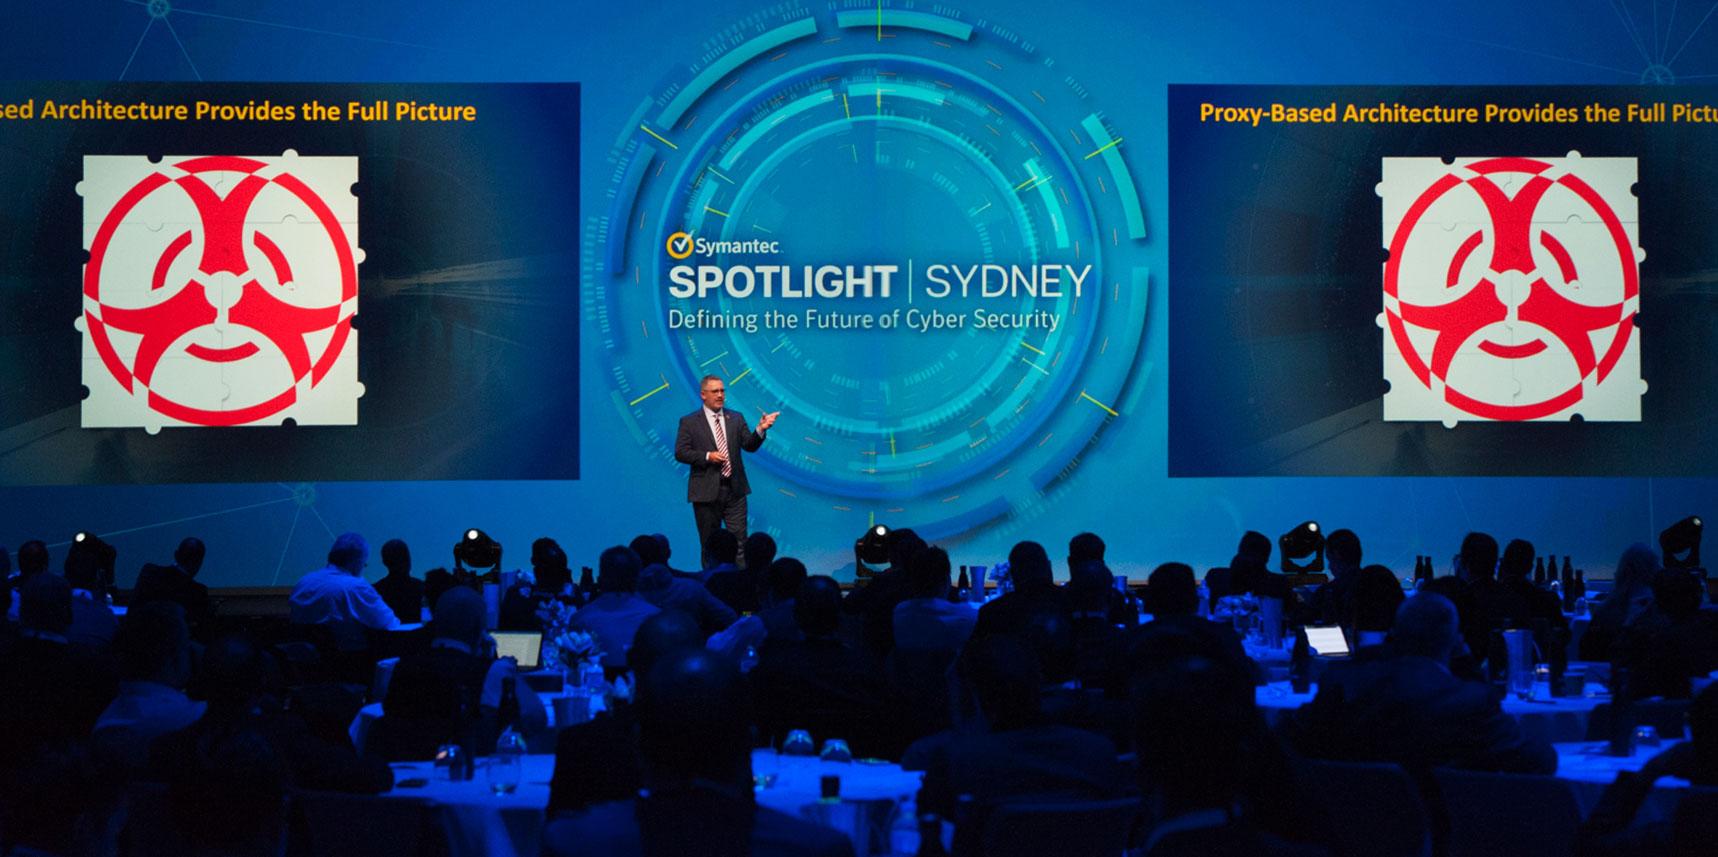 Symantec Spotlight Conference